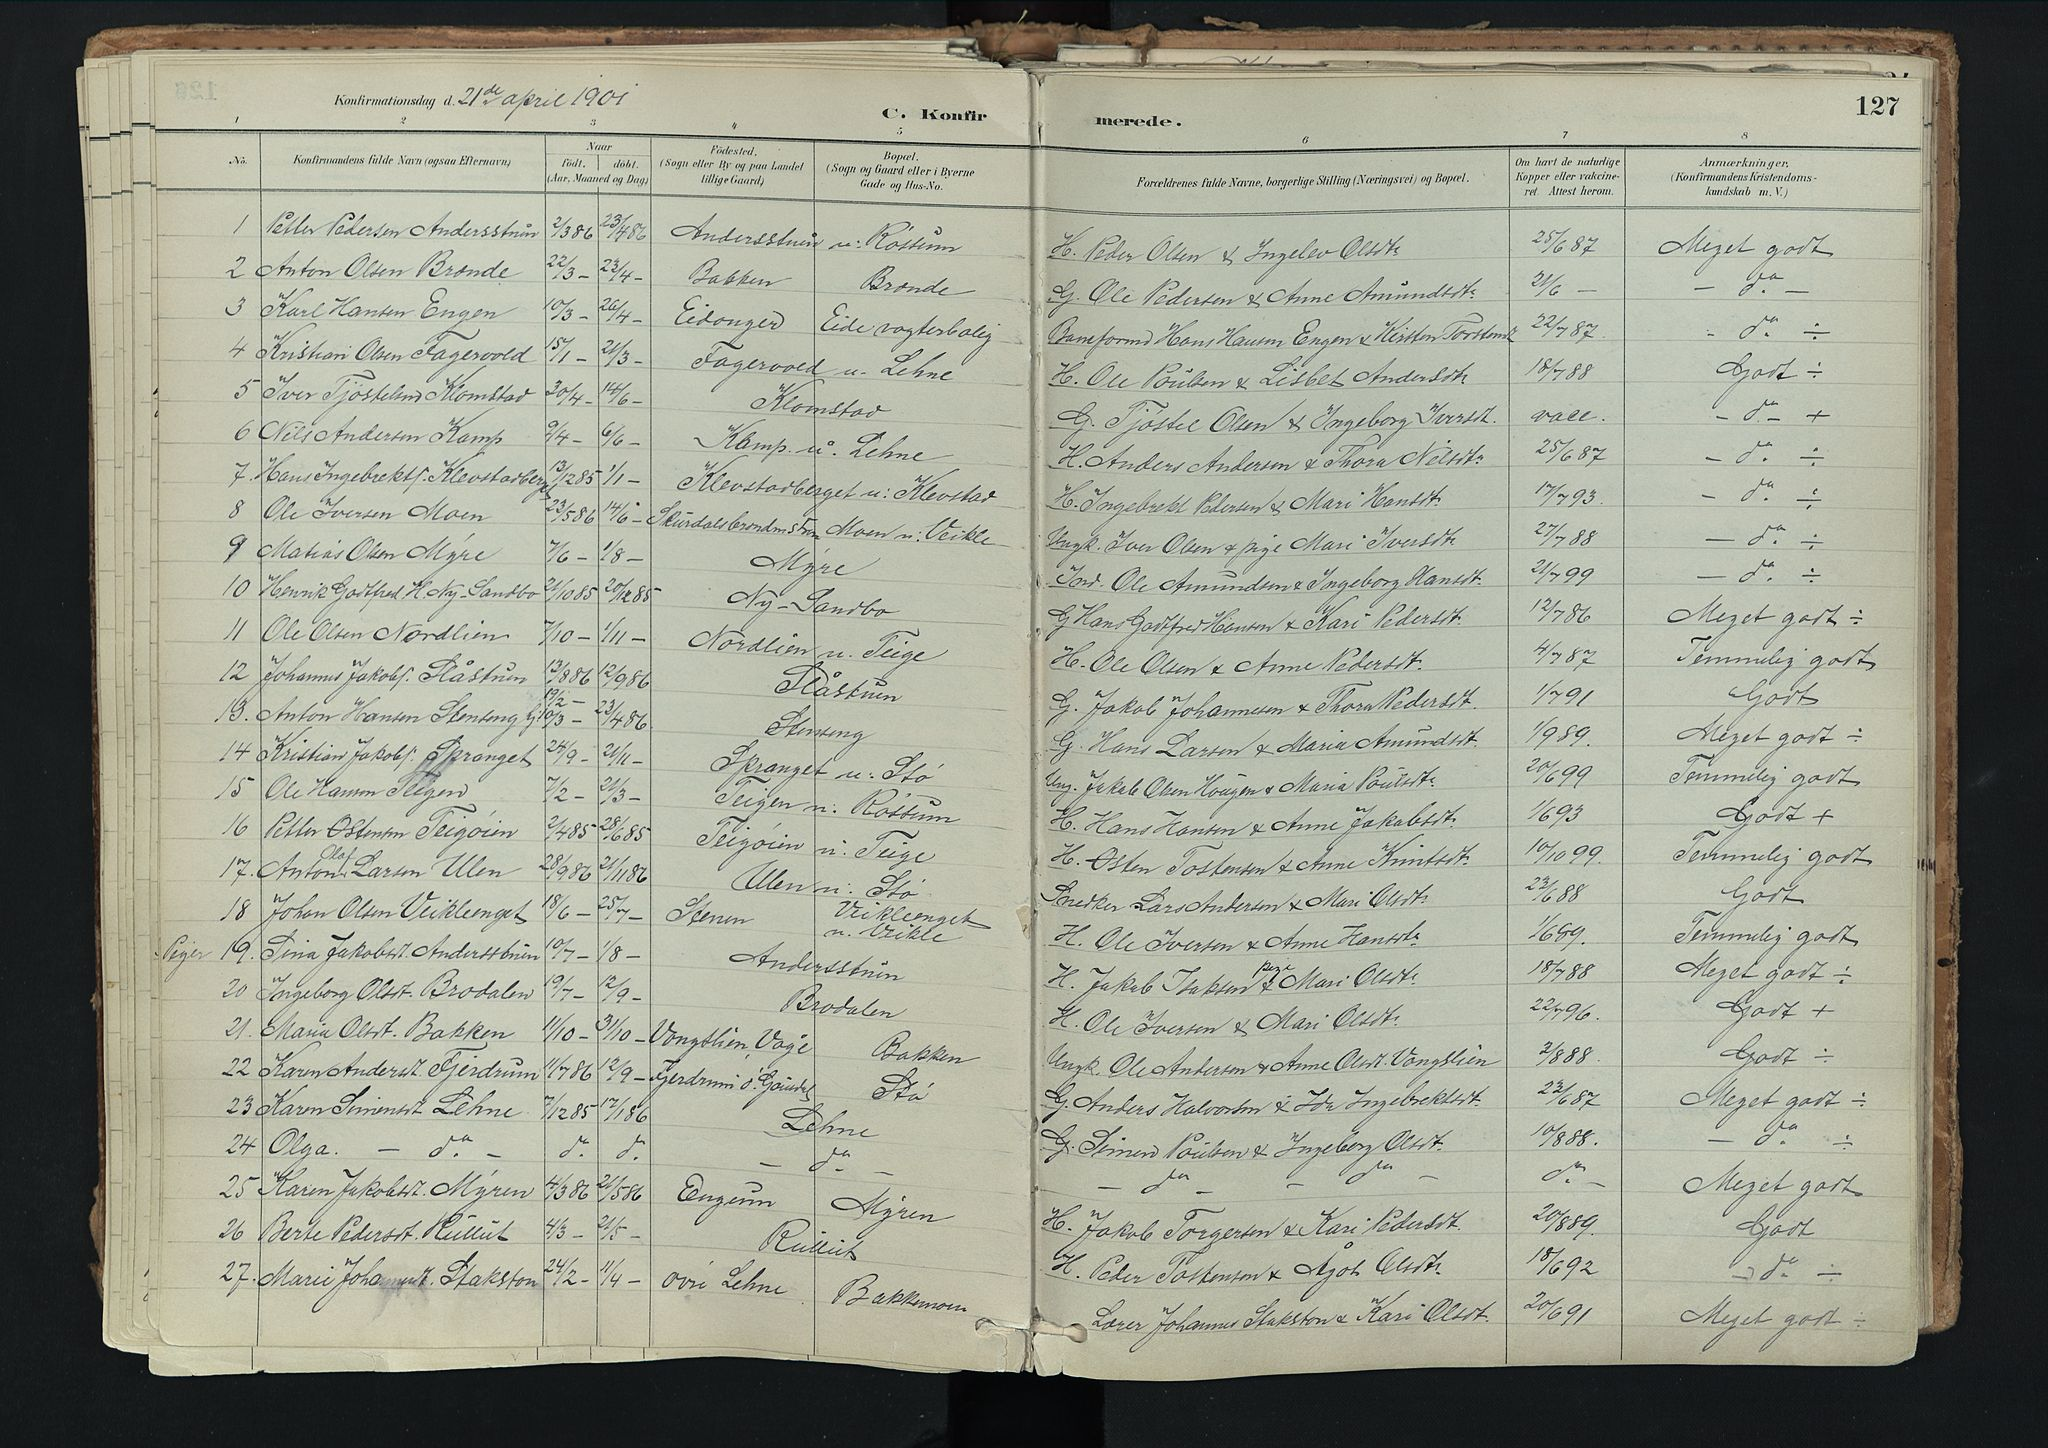 SAH, Nord-Fron prestekontor, Ministerialbok nr. 3, 1884-1914, s. 127